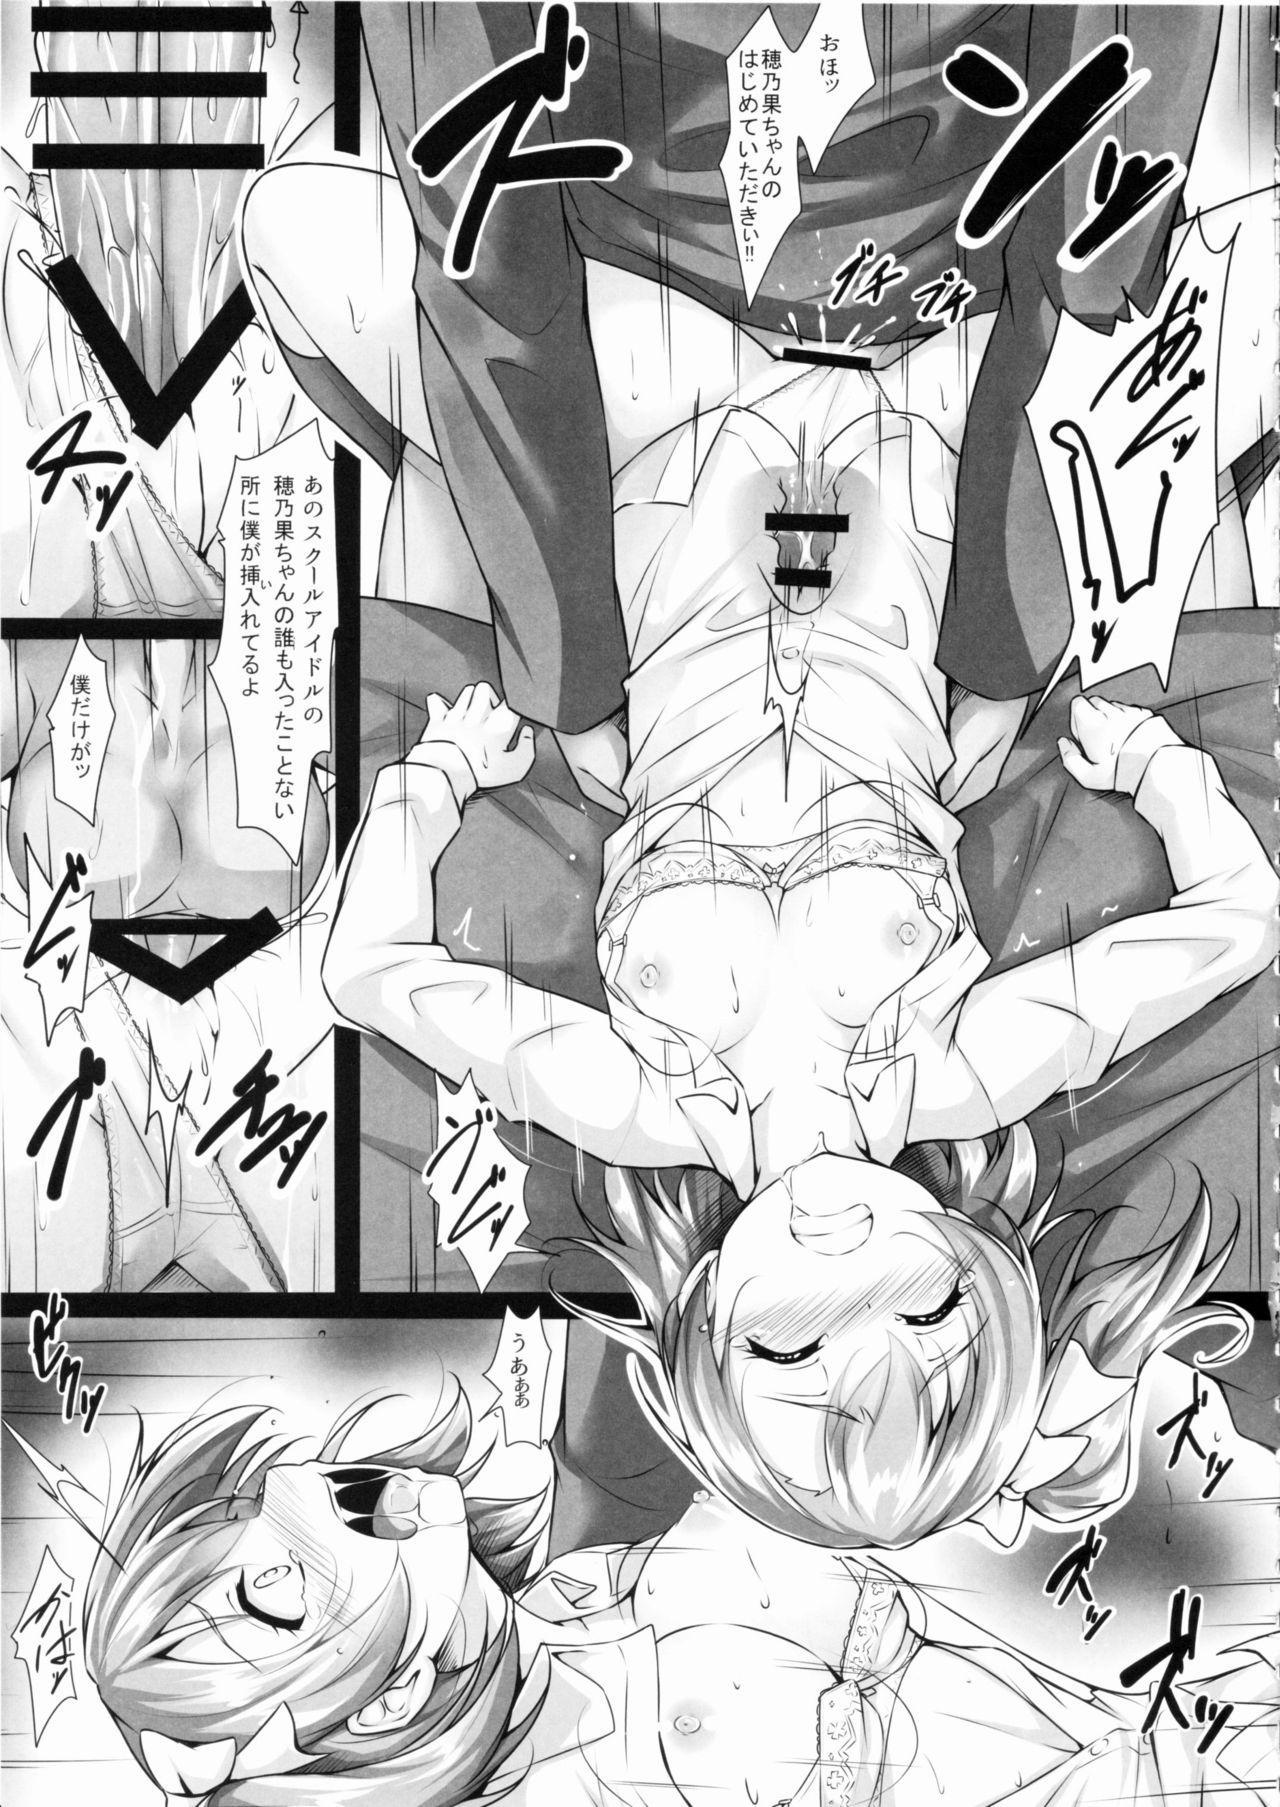 (C90) [corori (Yopparai Oni?)] HONOKAN ~ Damasare ~ Dokonimo nige rarenai ~! (Love Live!) 28